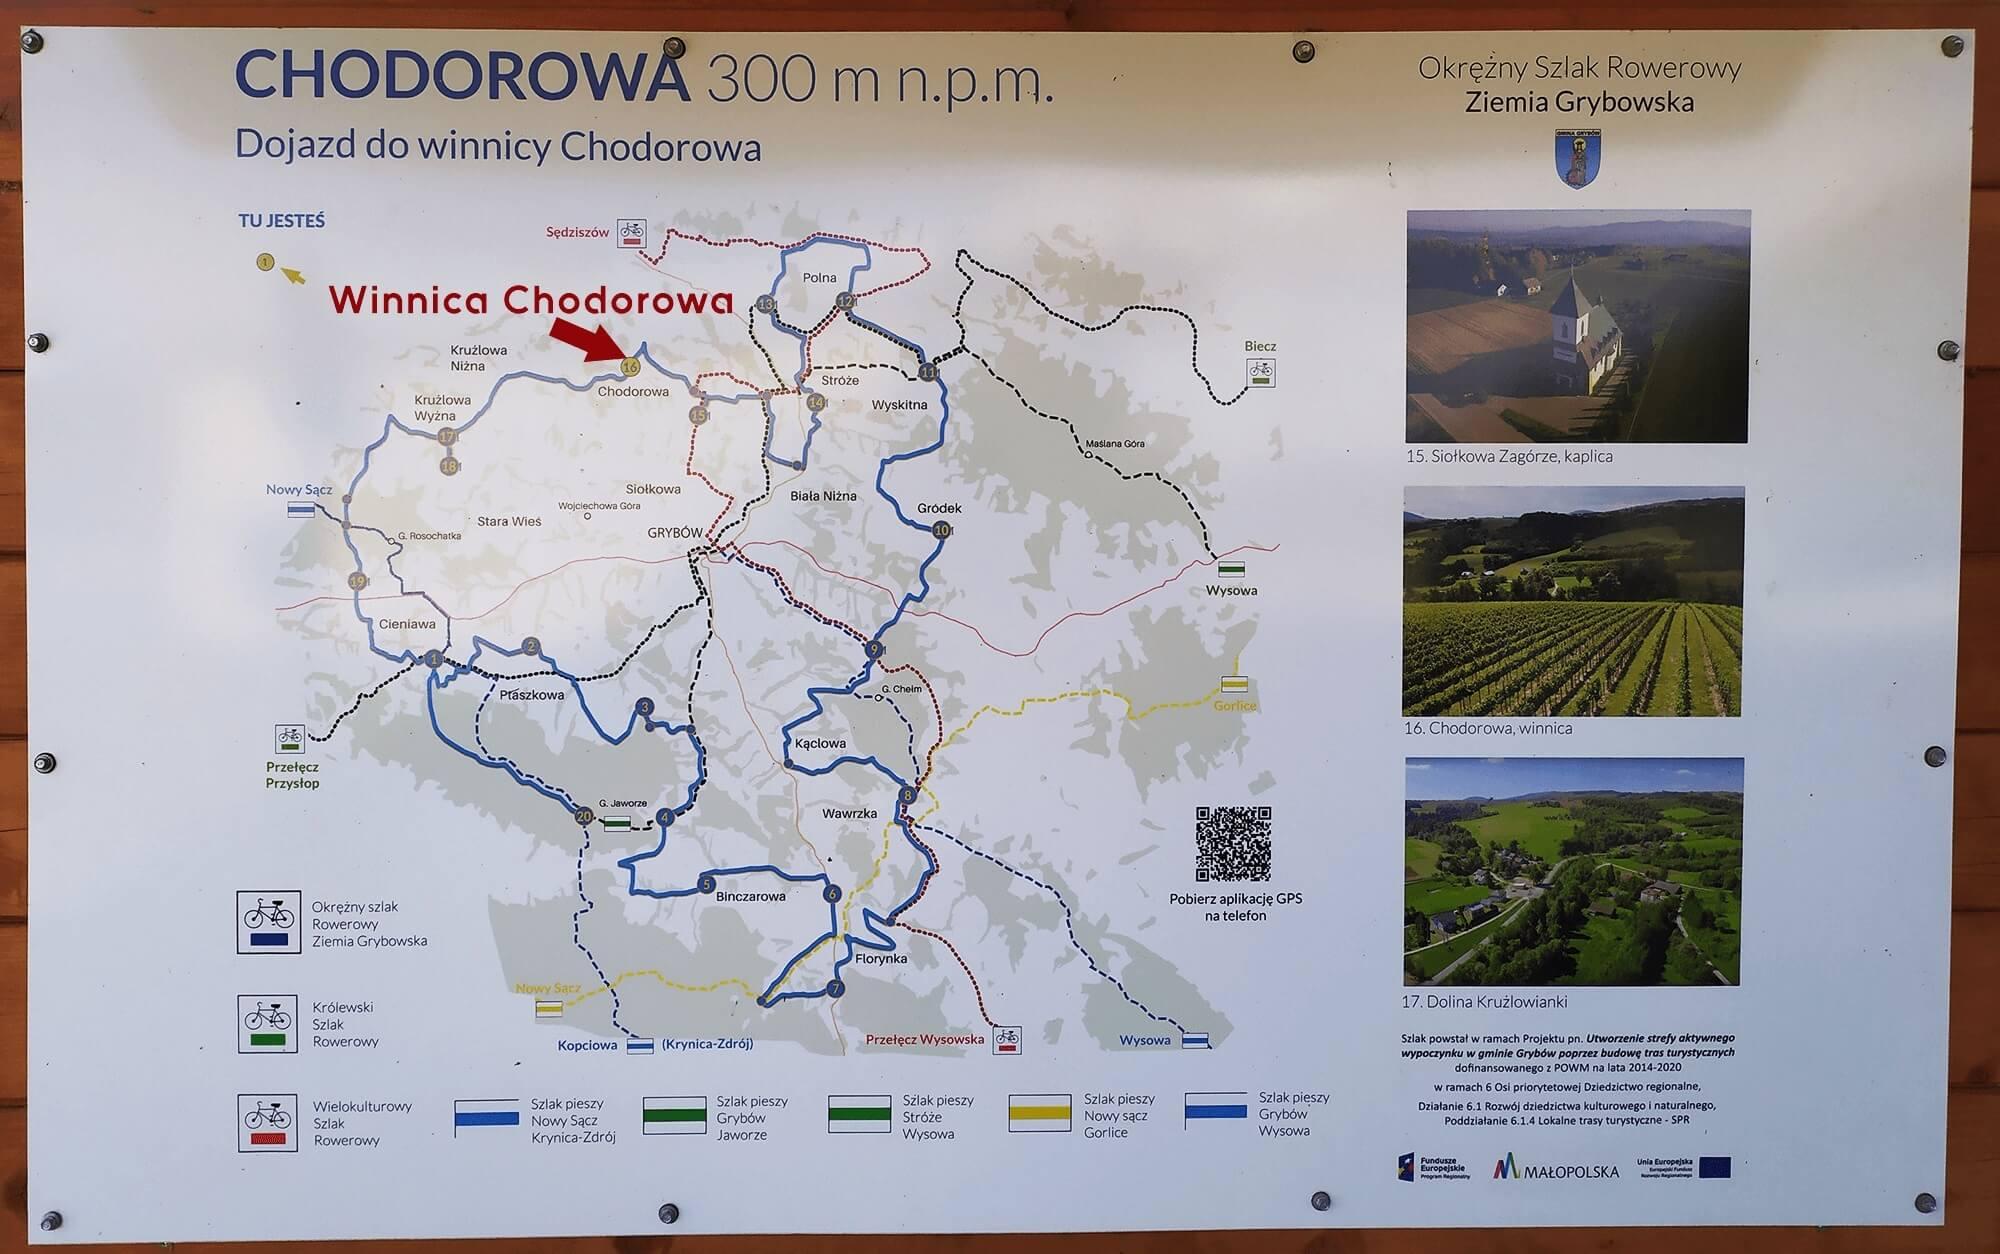 winnica chodorowa jak dojechac, mapa